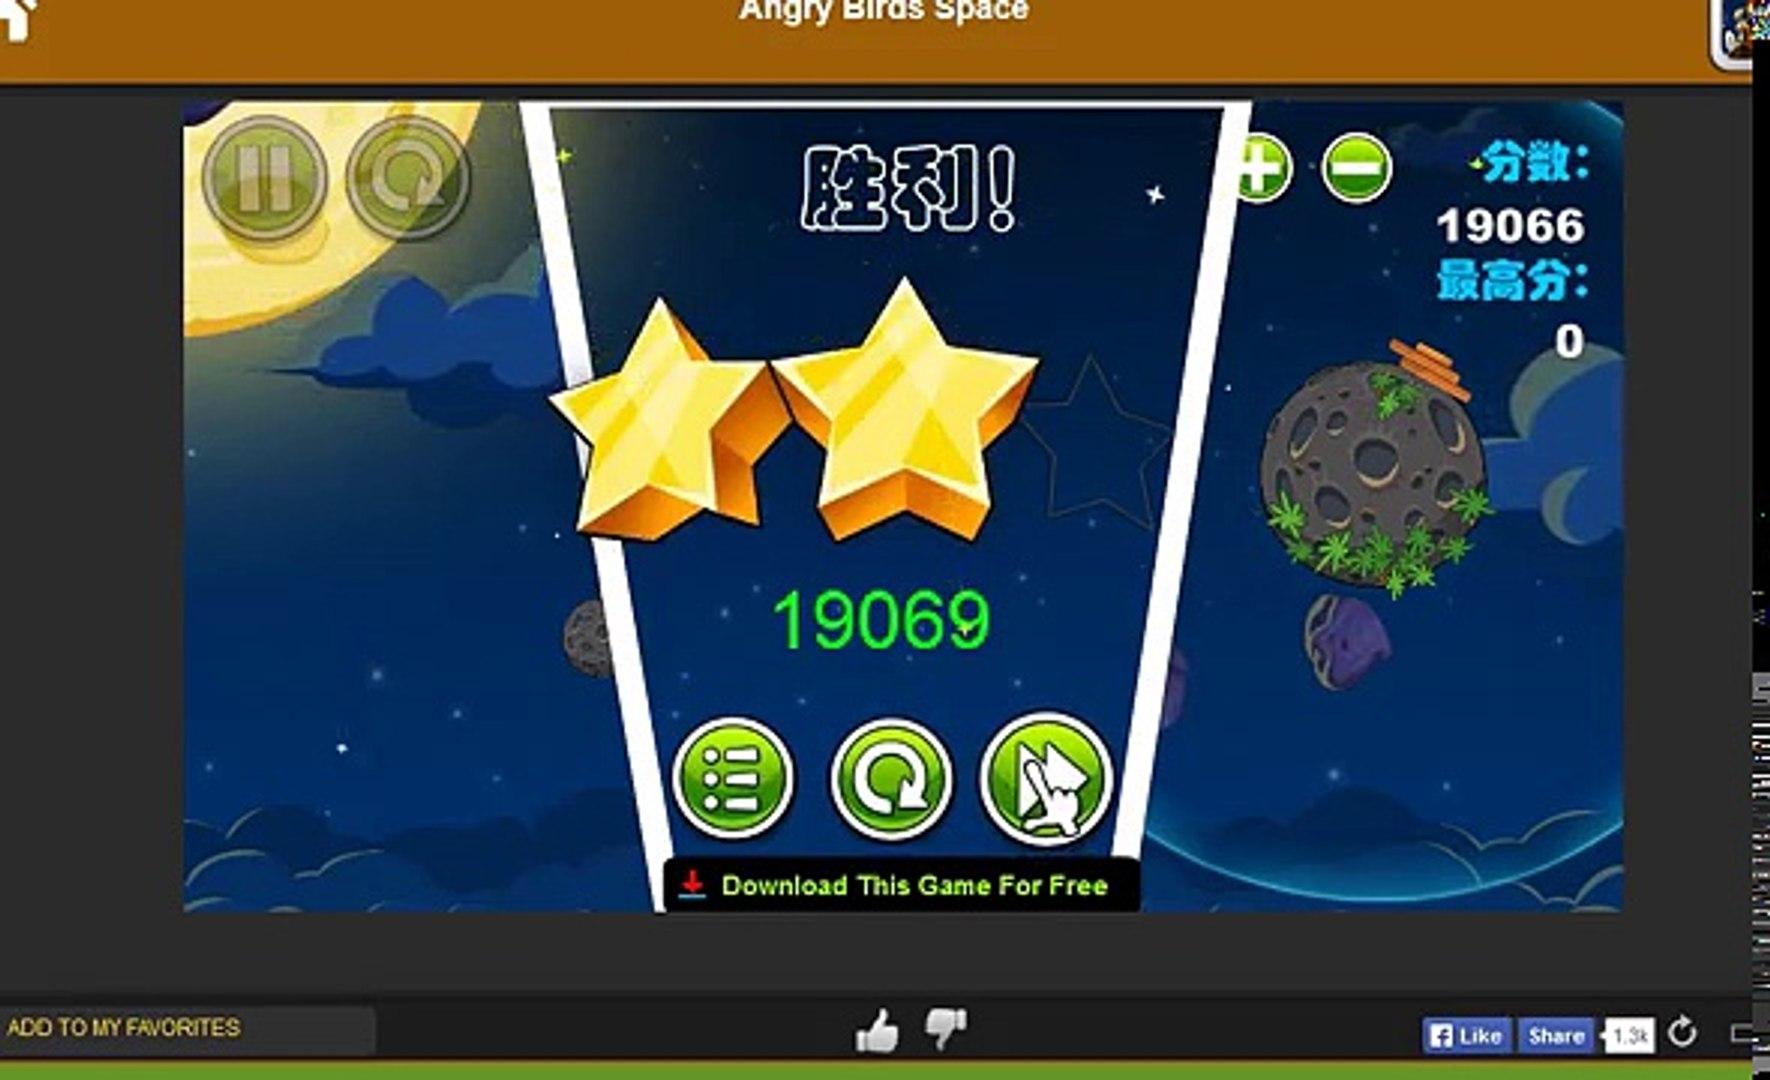 Angry Birds Space Beak Imp Part 1 - Level 8-1 to 8-20 Walkthrough (3 Stars)